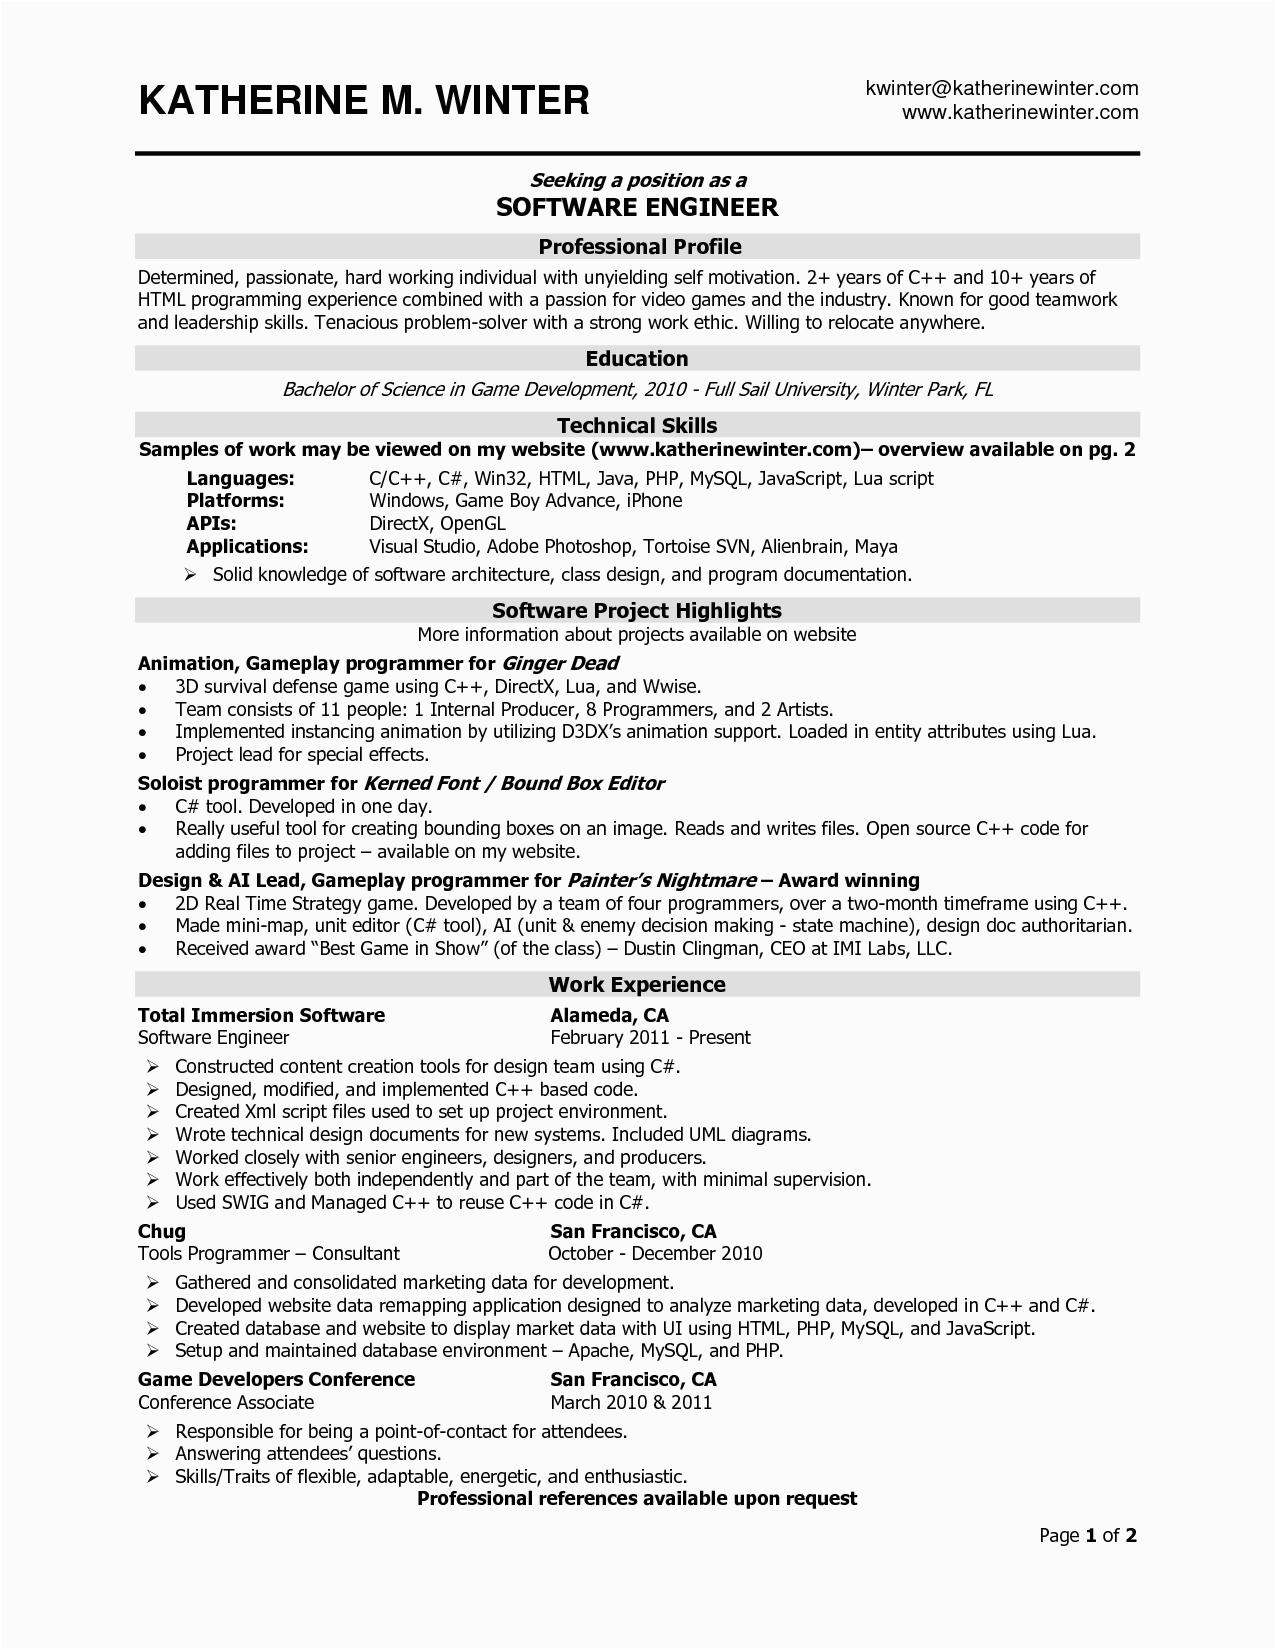 experienced software engineer resume 4444